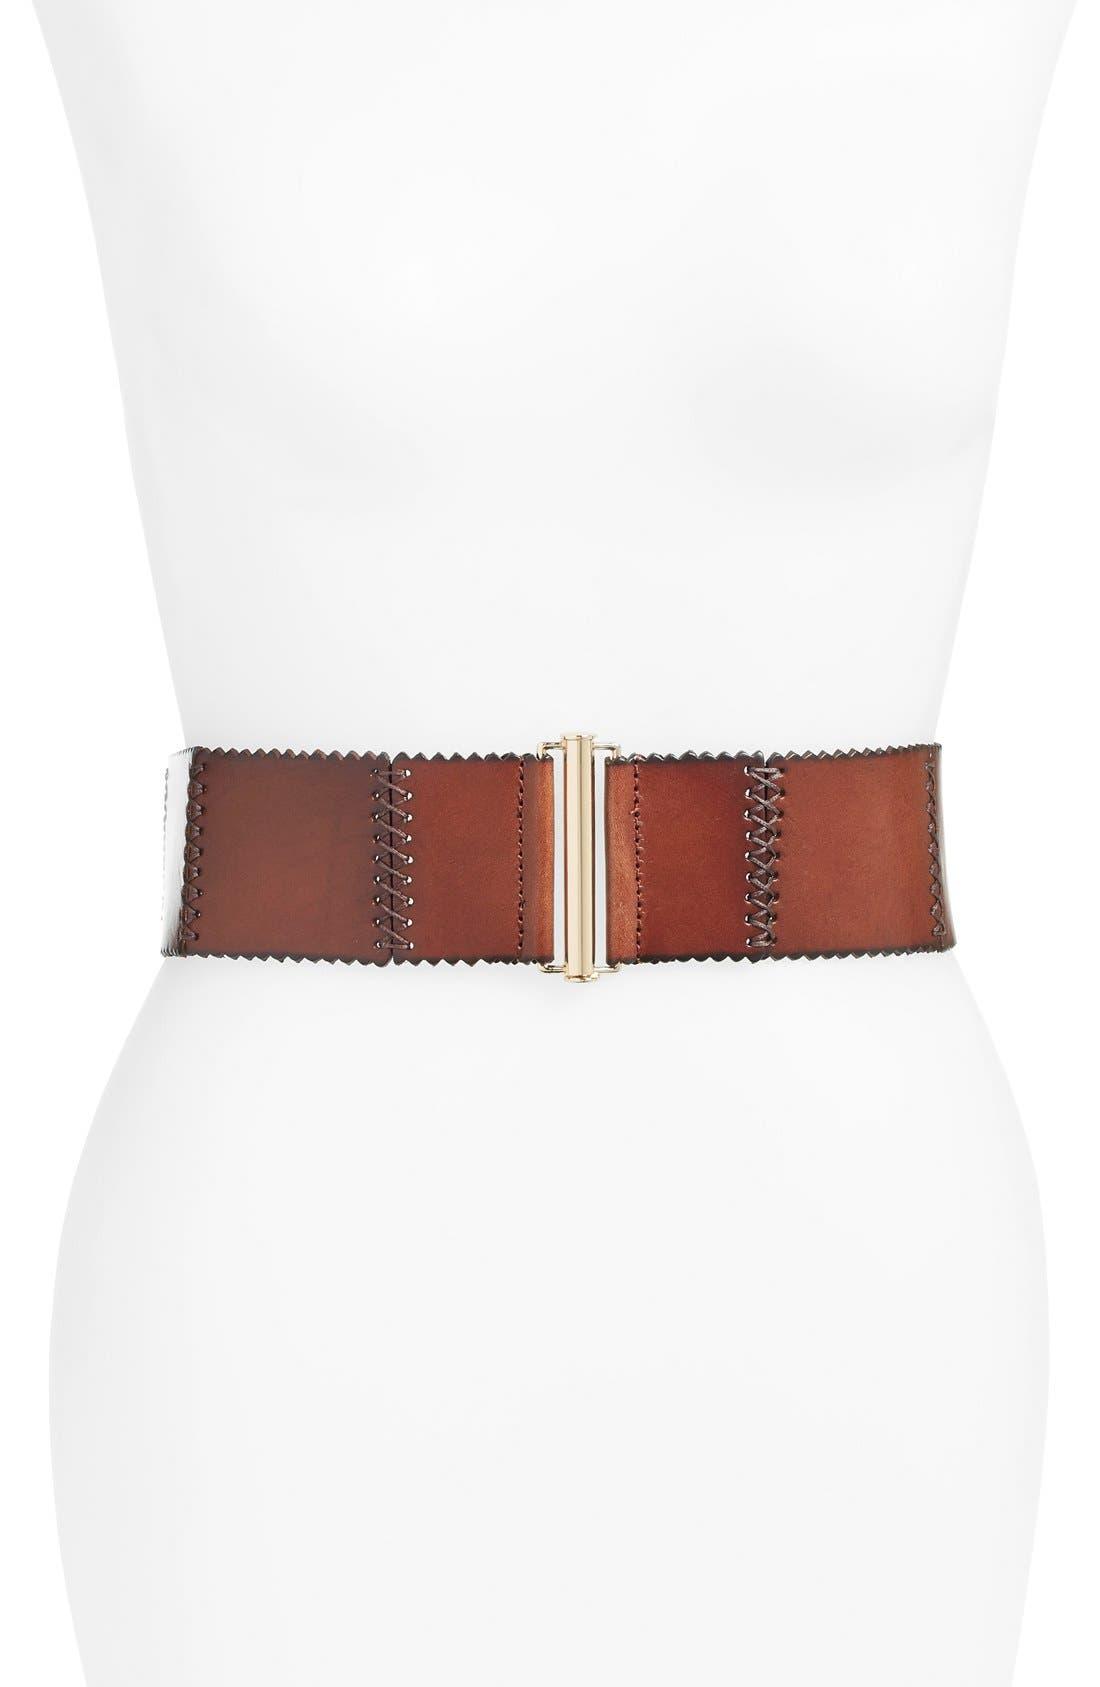 ELISE M. 'Woodland' Stitched Leather Belt, Main, color, 250